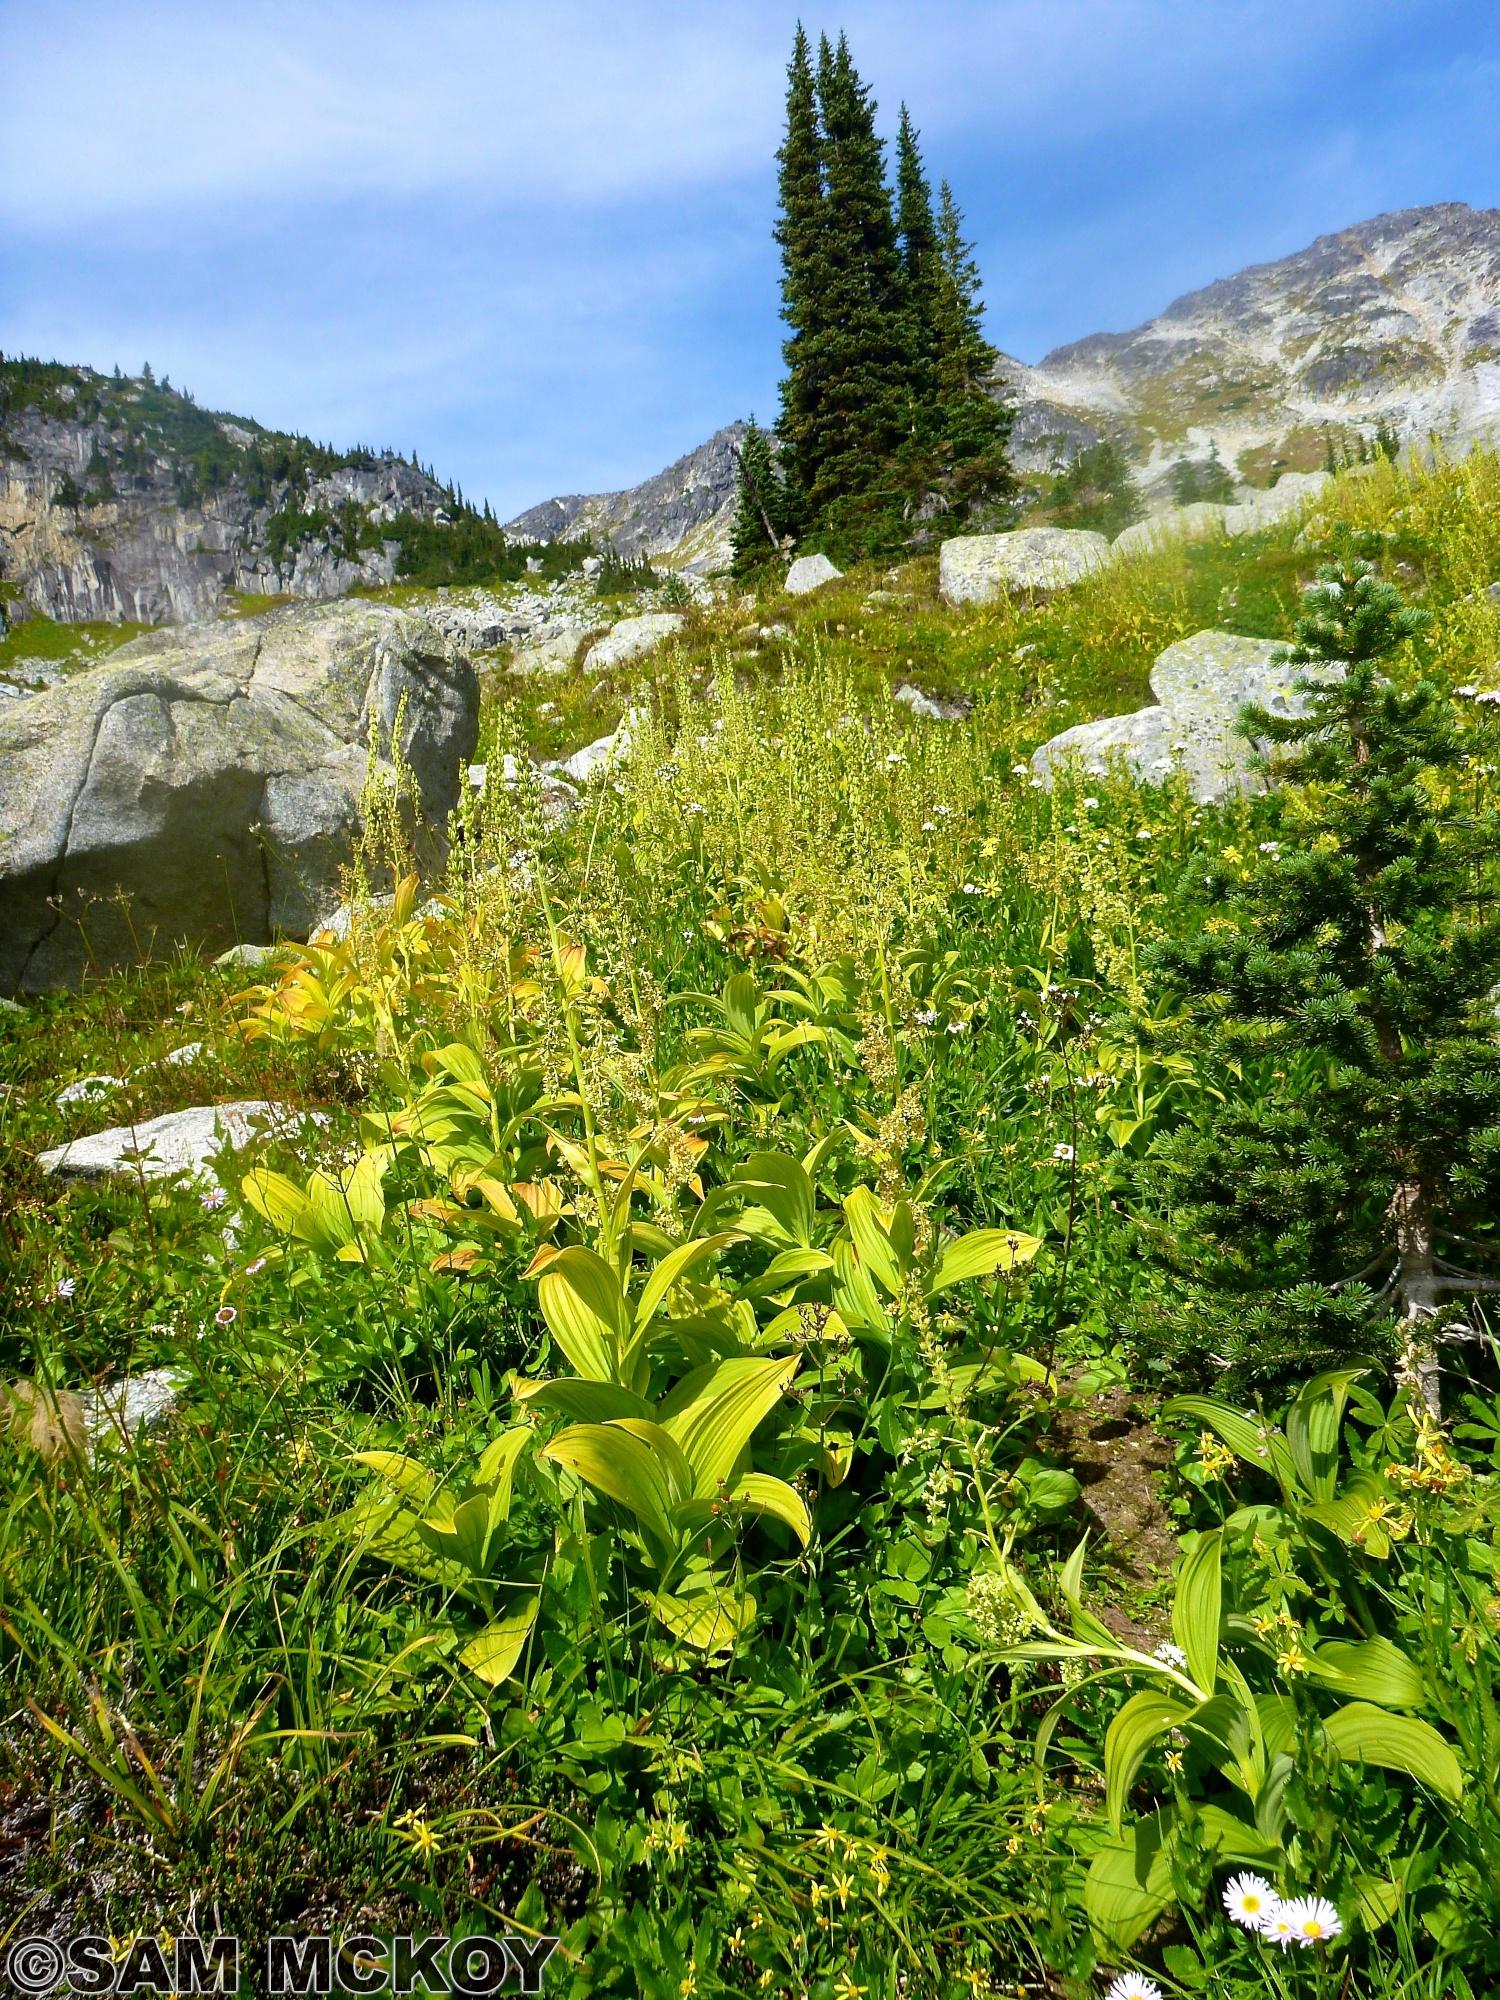 Alpine Meadows above the Wendy Thompson Hut